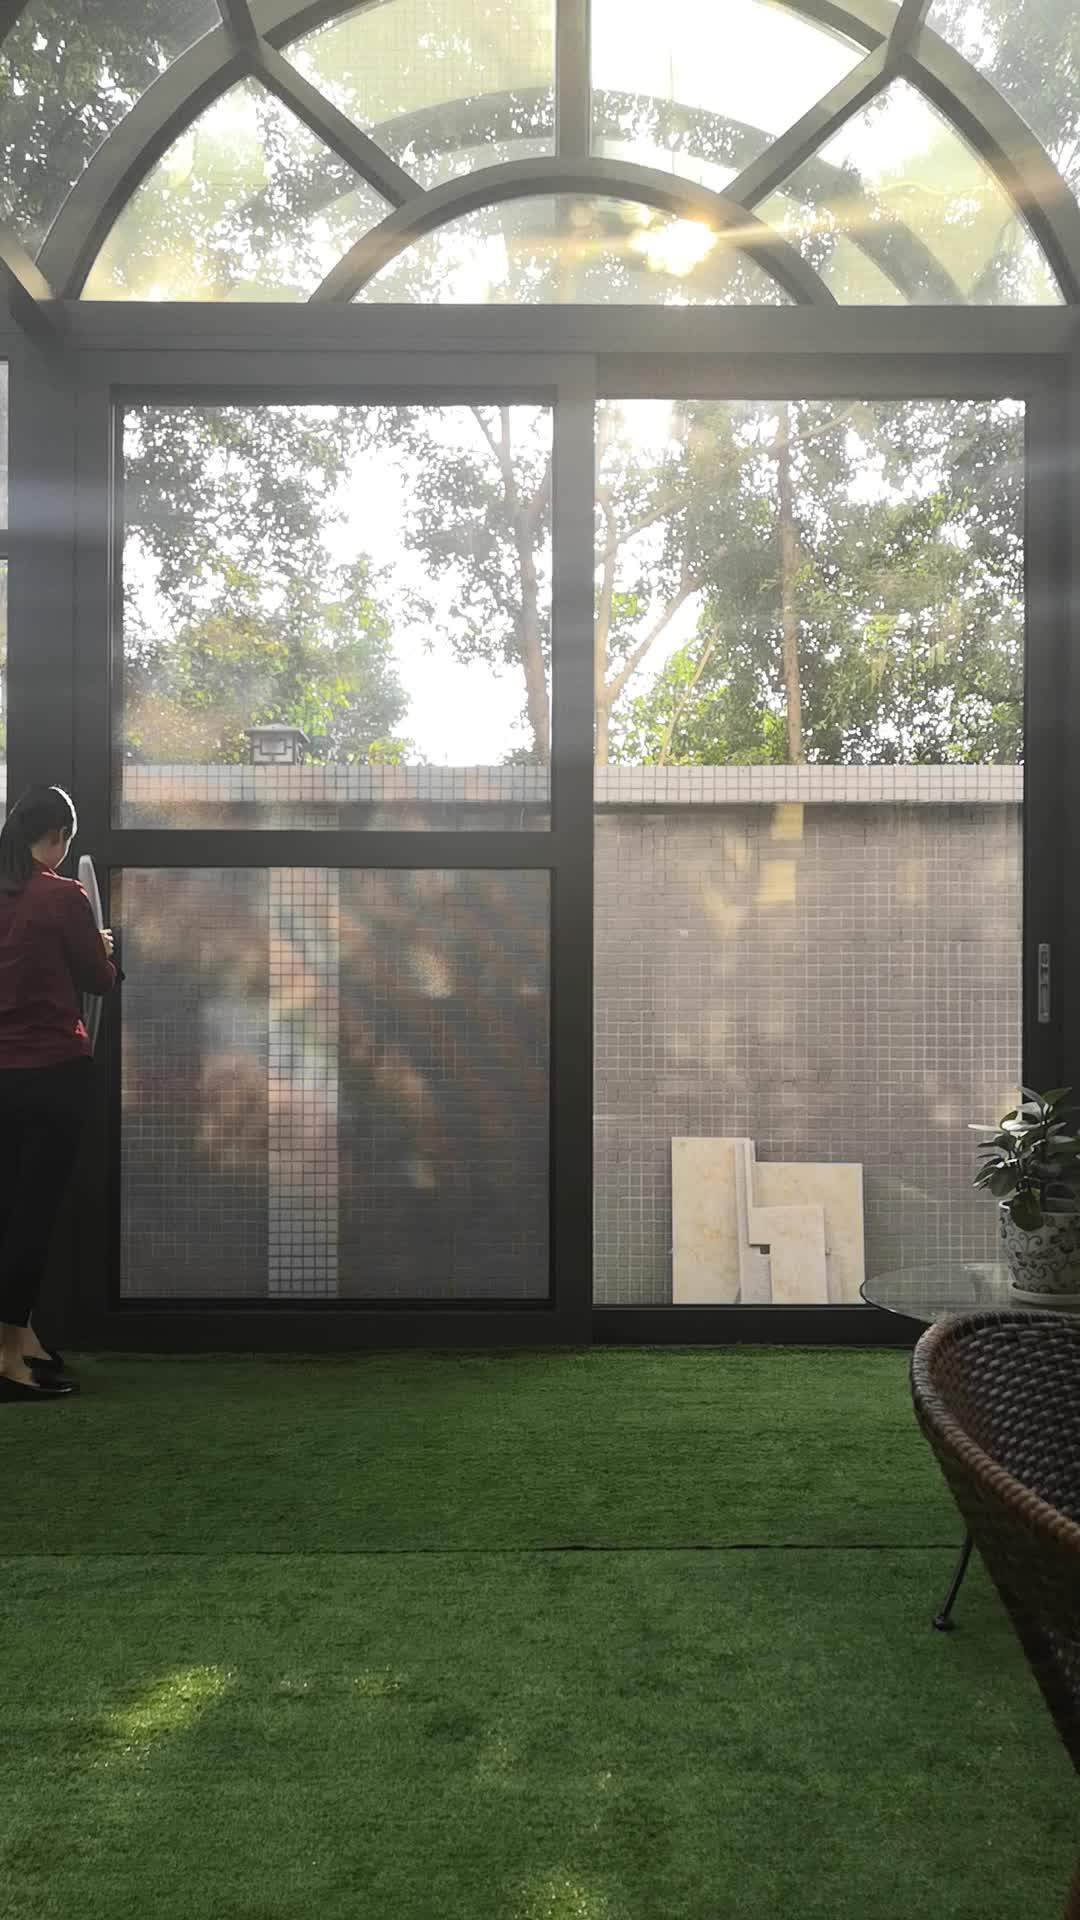 Cheap price lowe glass aluminum sliding balcony sliding doors interior and exterior room divider